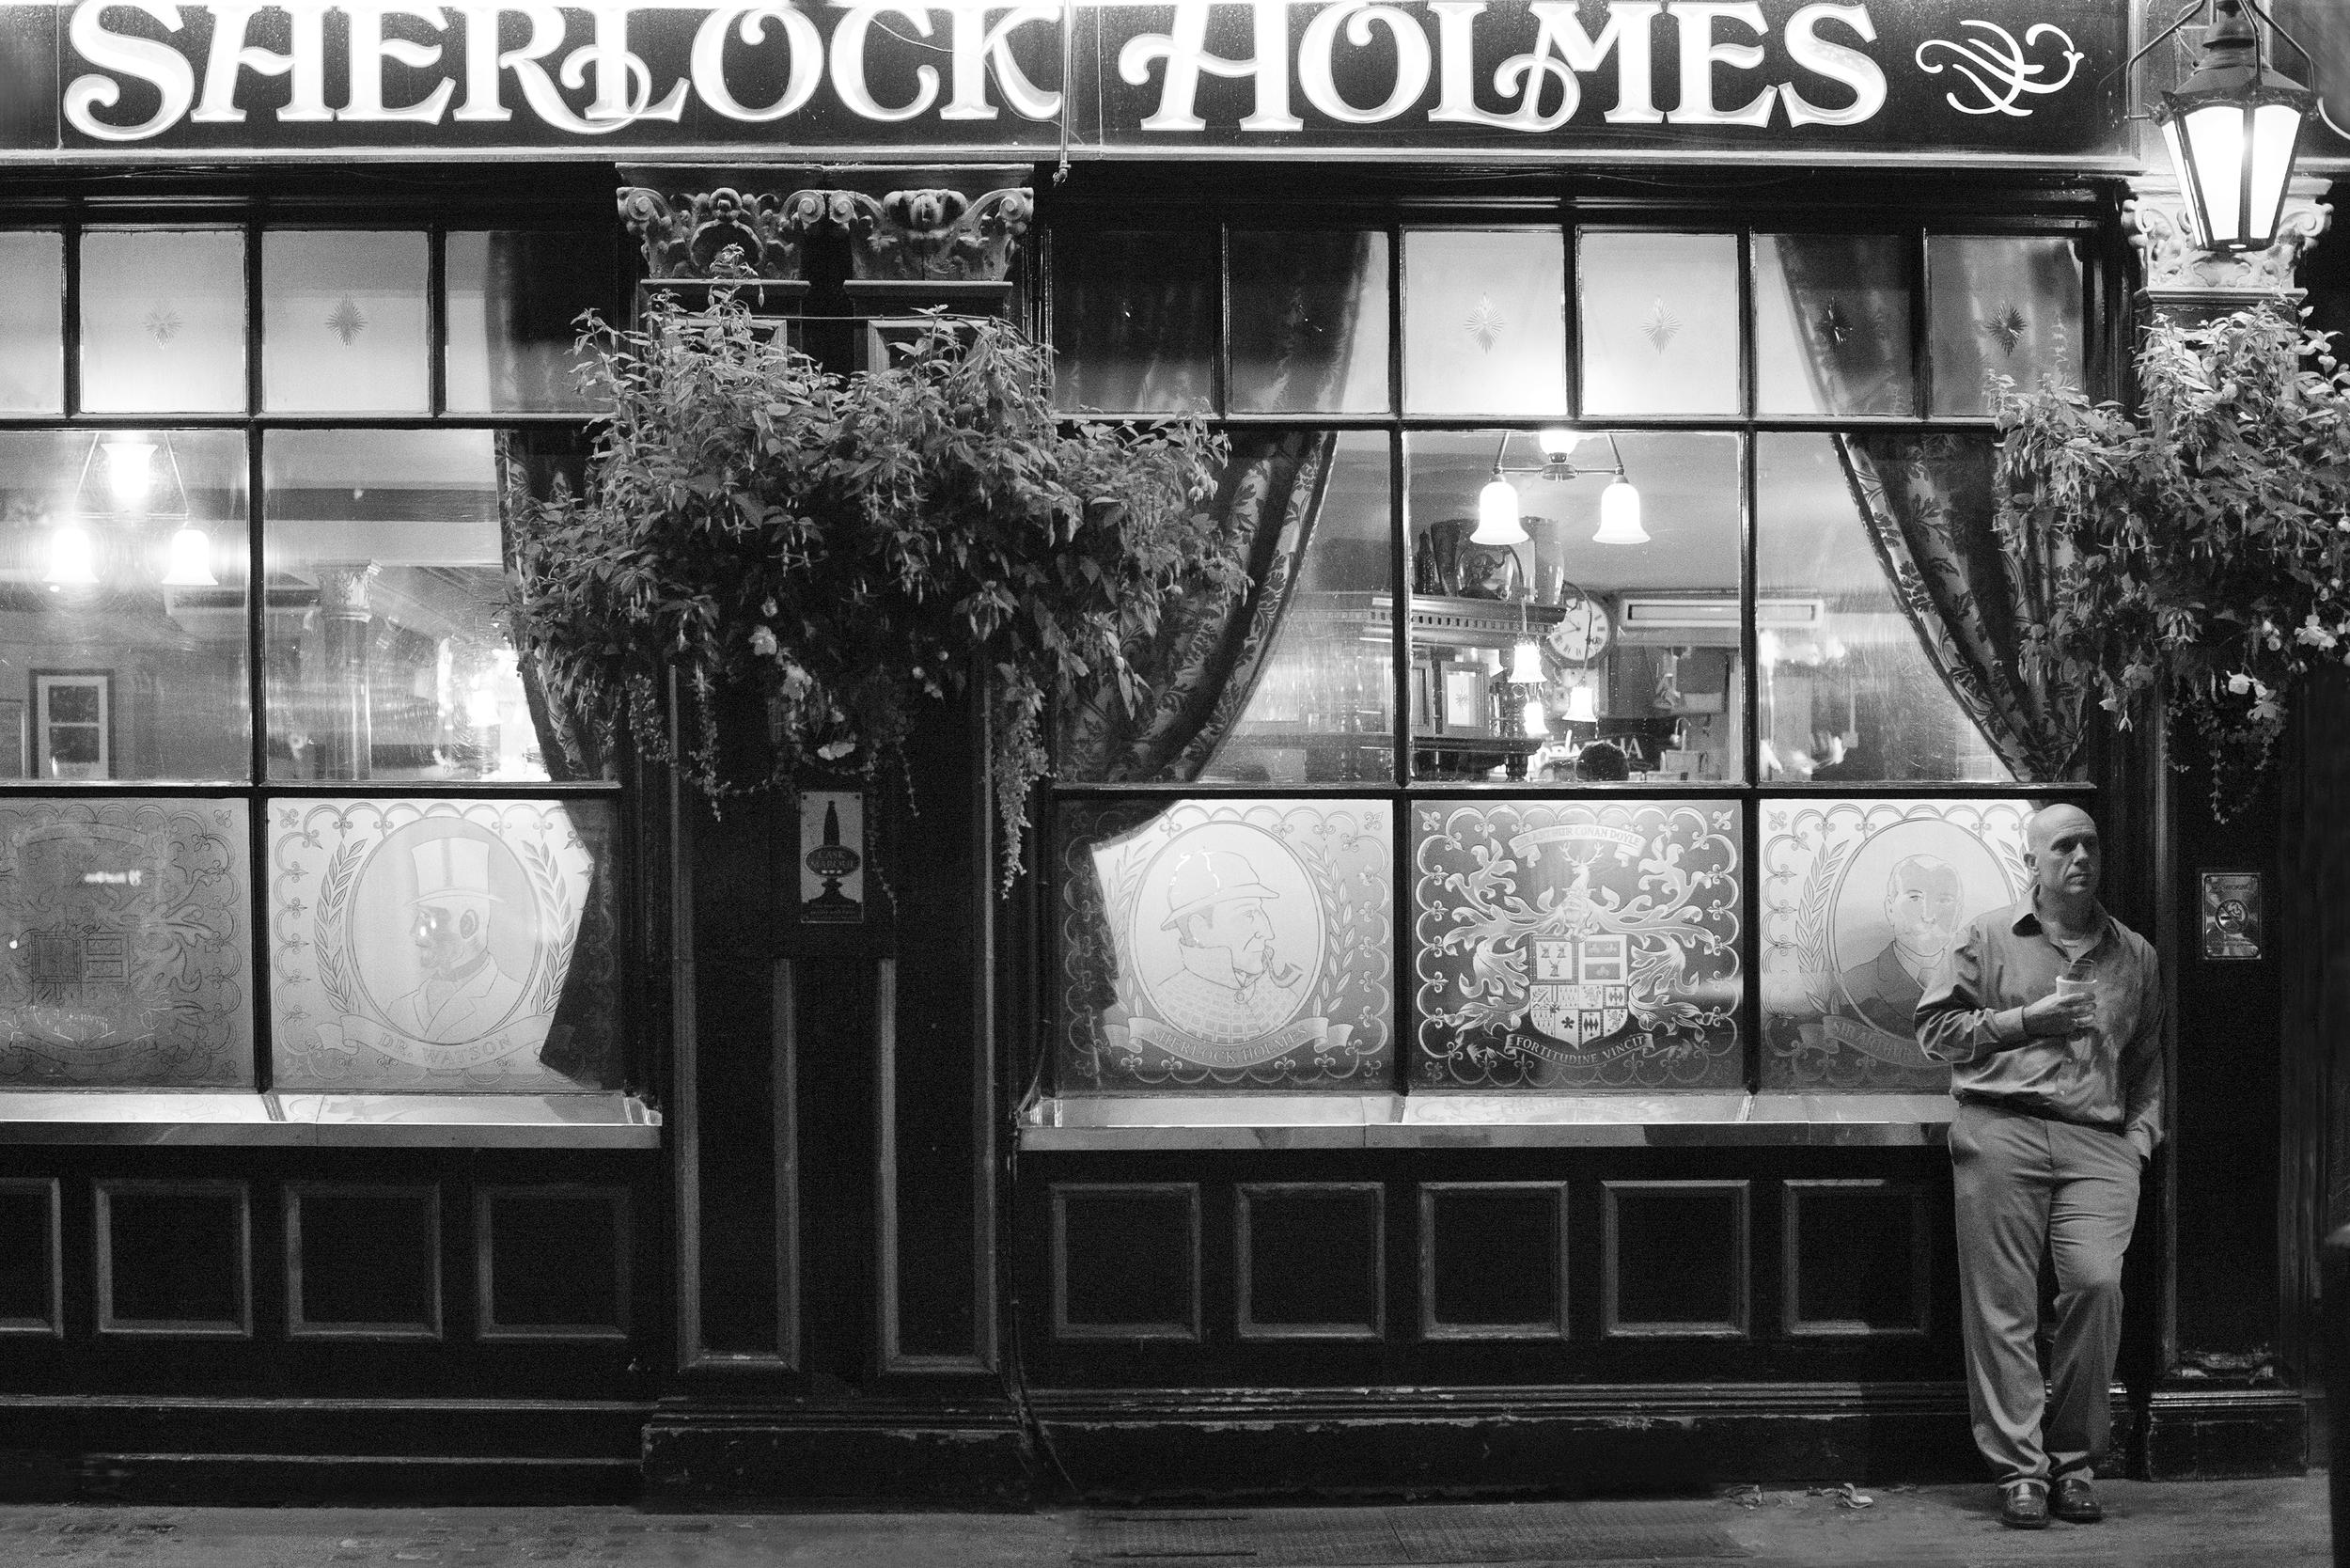 Sherlock+Holmes_London_REDUCED.jpg